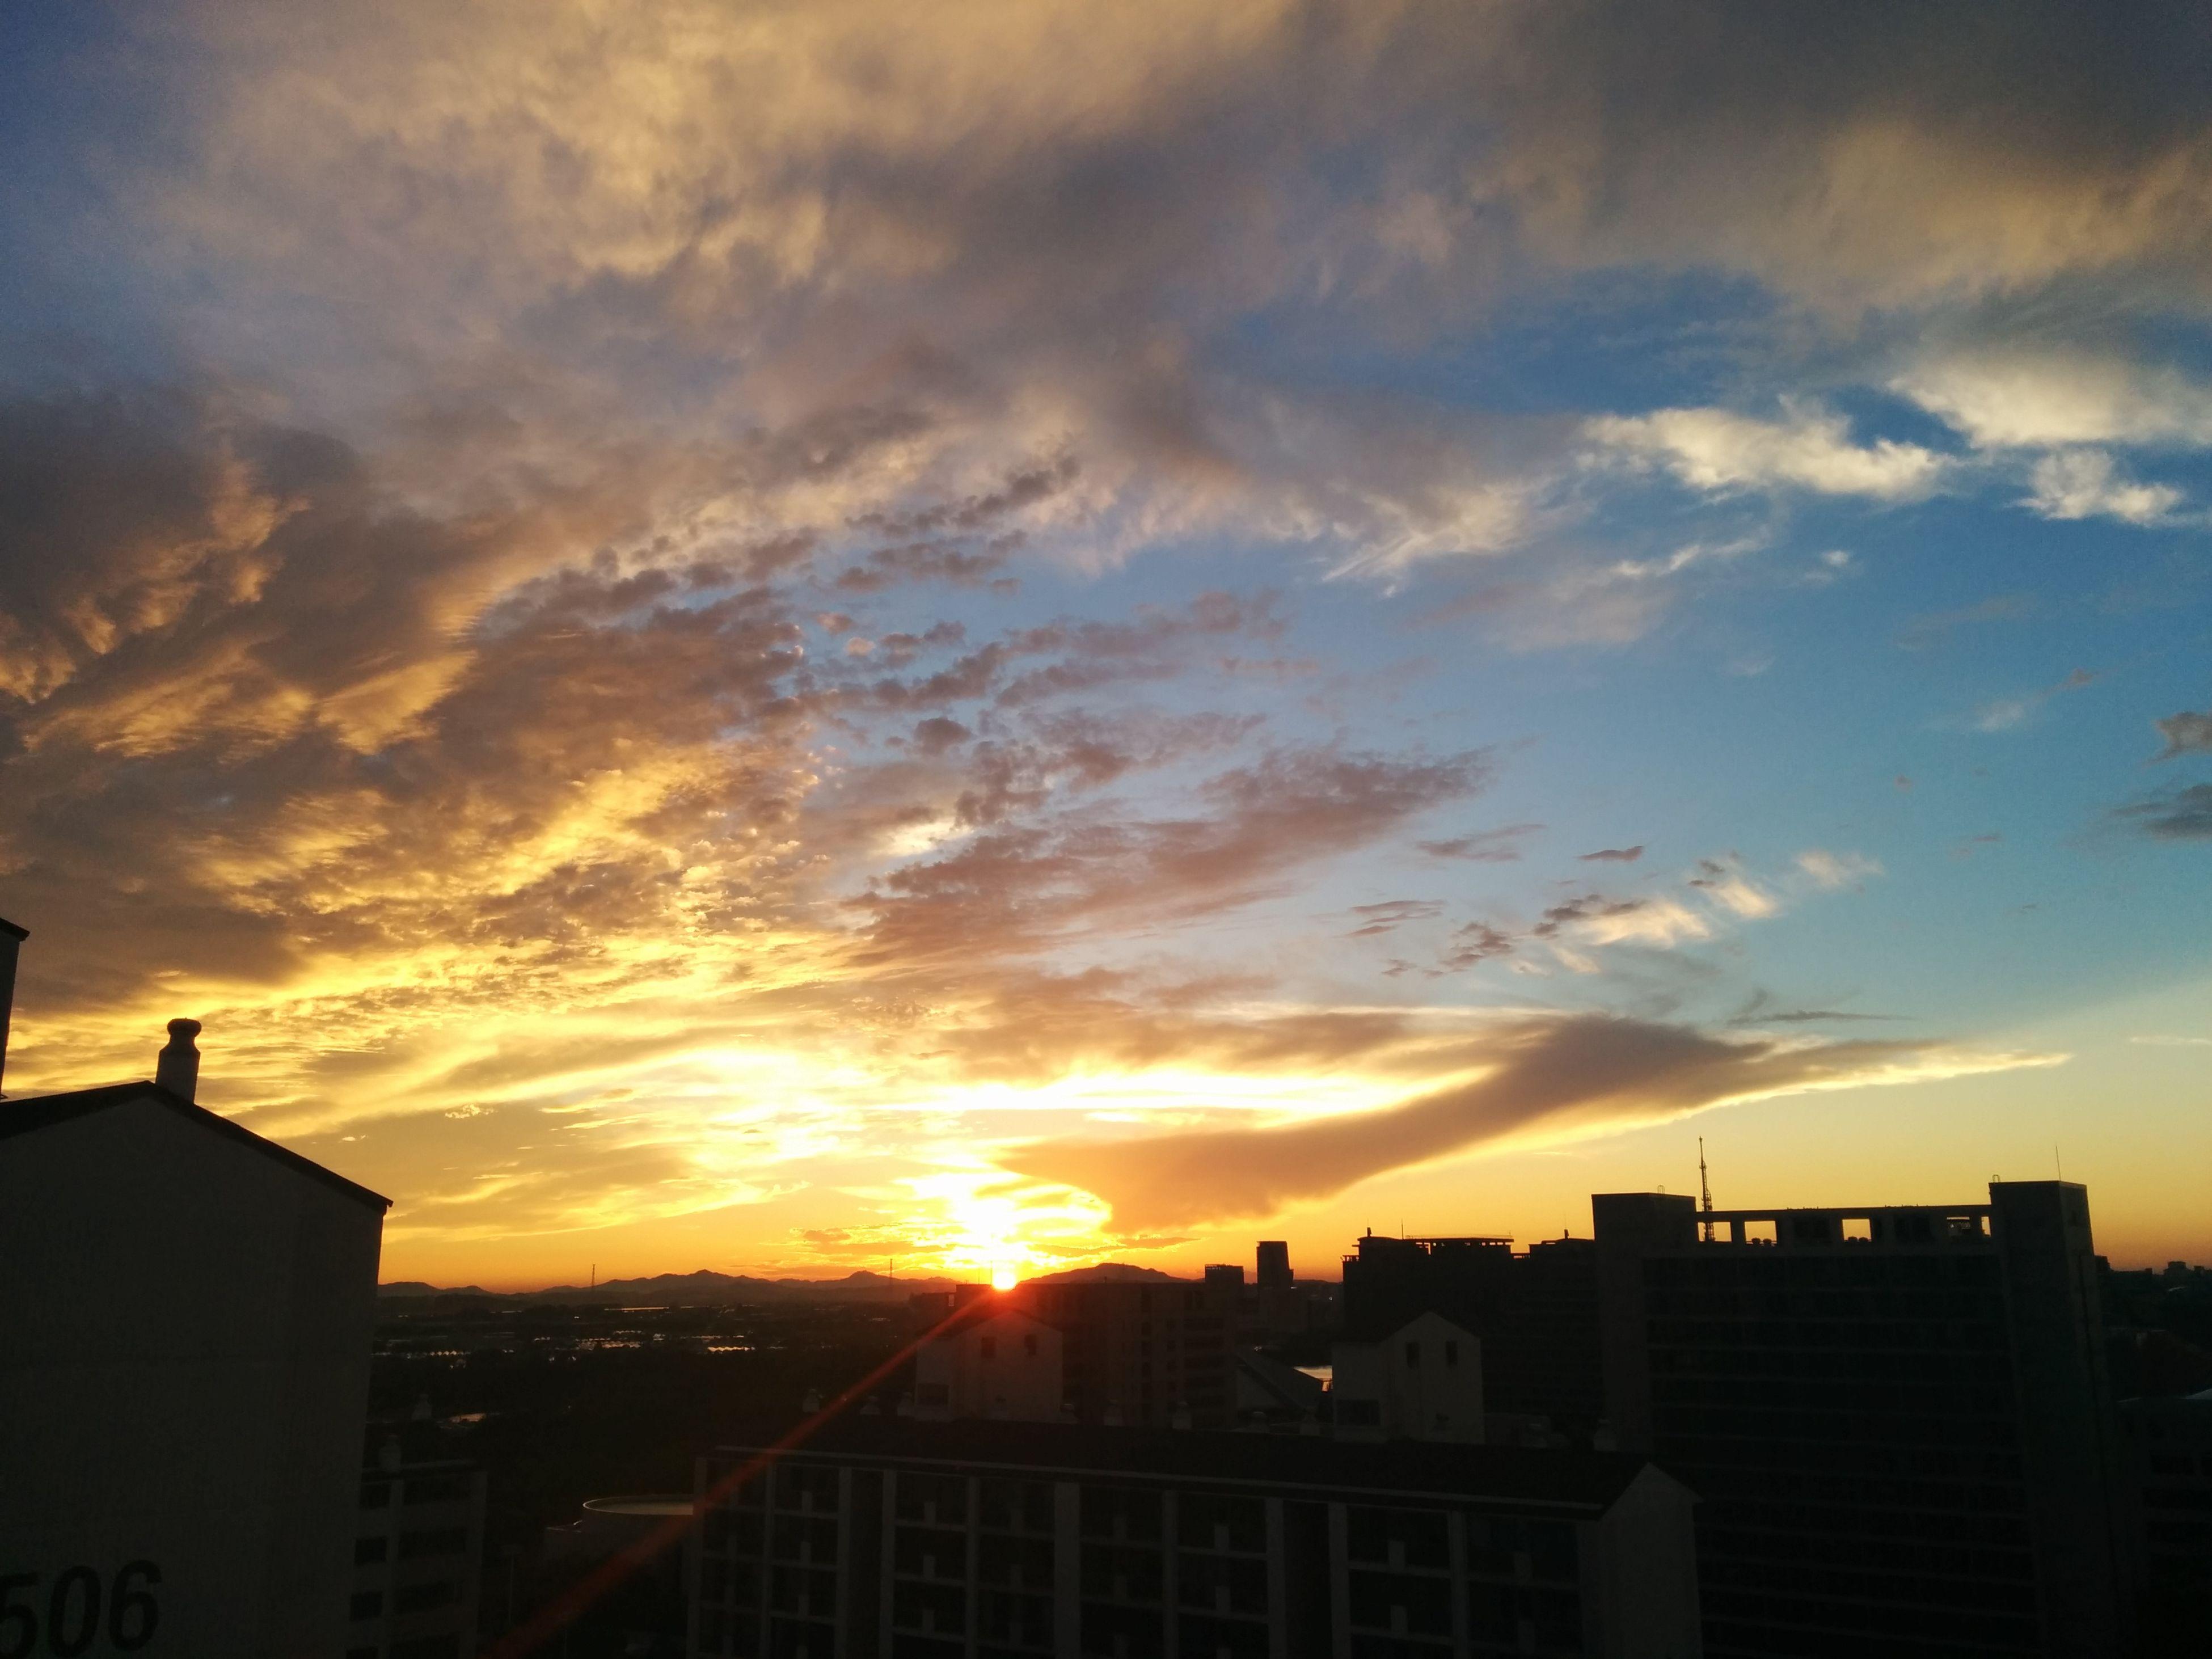 sunset, building exterior, architecture, built structure, sky, silhouette, orange color, cloud - sky, city, sun, cityscape, cloud, residential building, residential structure, building, beauty in nature, sunlight, dramatic sky, scenics, cloudy